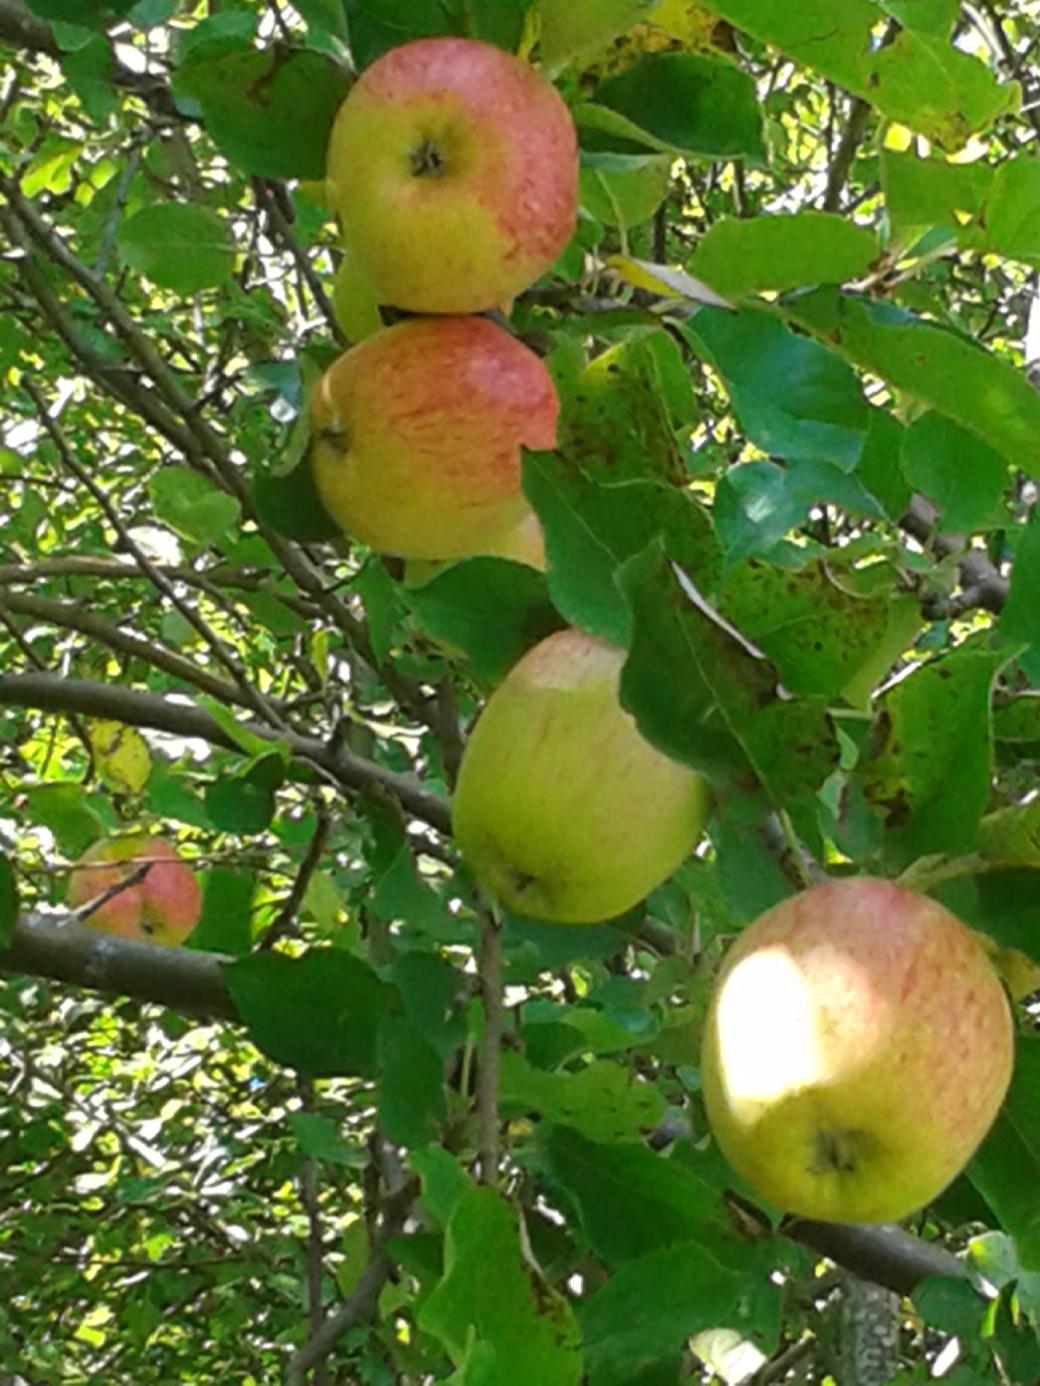 Inedible Apples